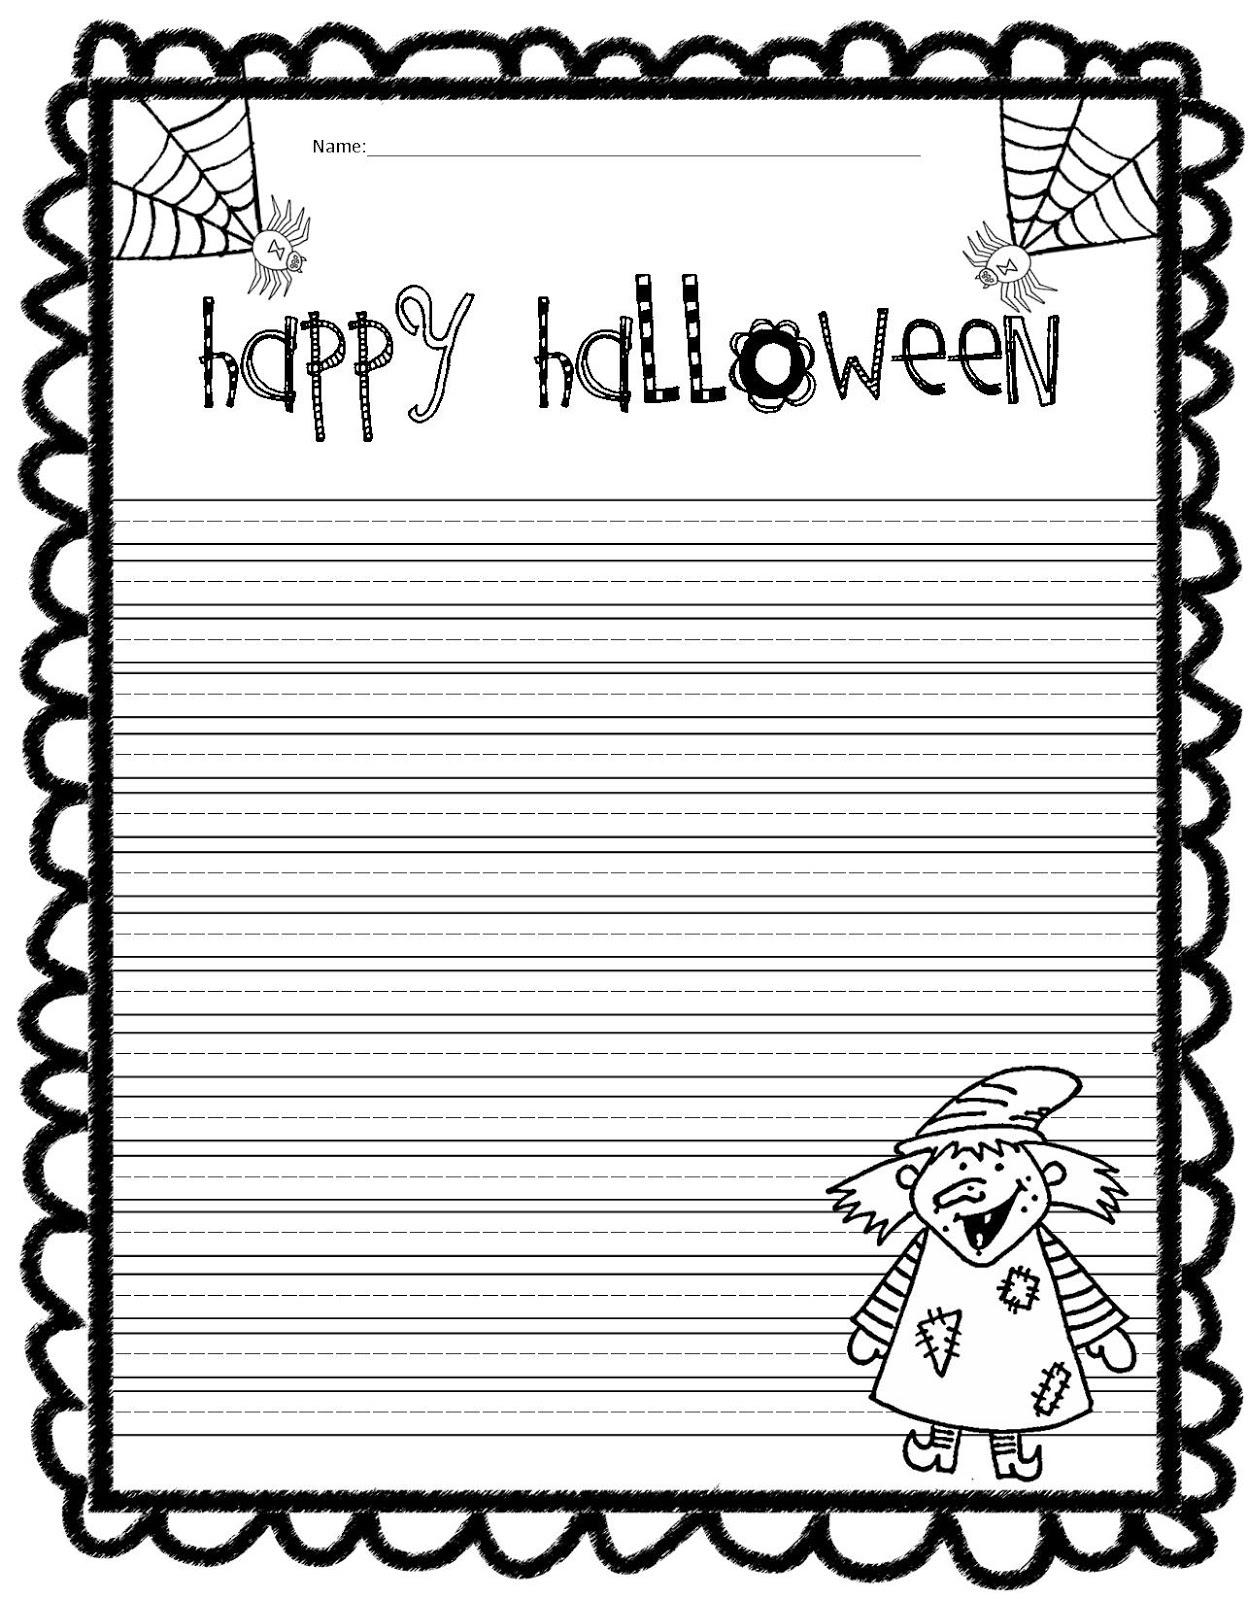 Bat Writing Paper | Essay Writing Service Gdhomeworkdhvp - Free Printable Bat Writing Paper